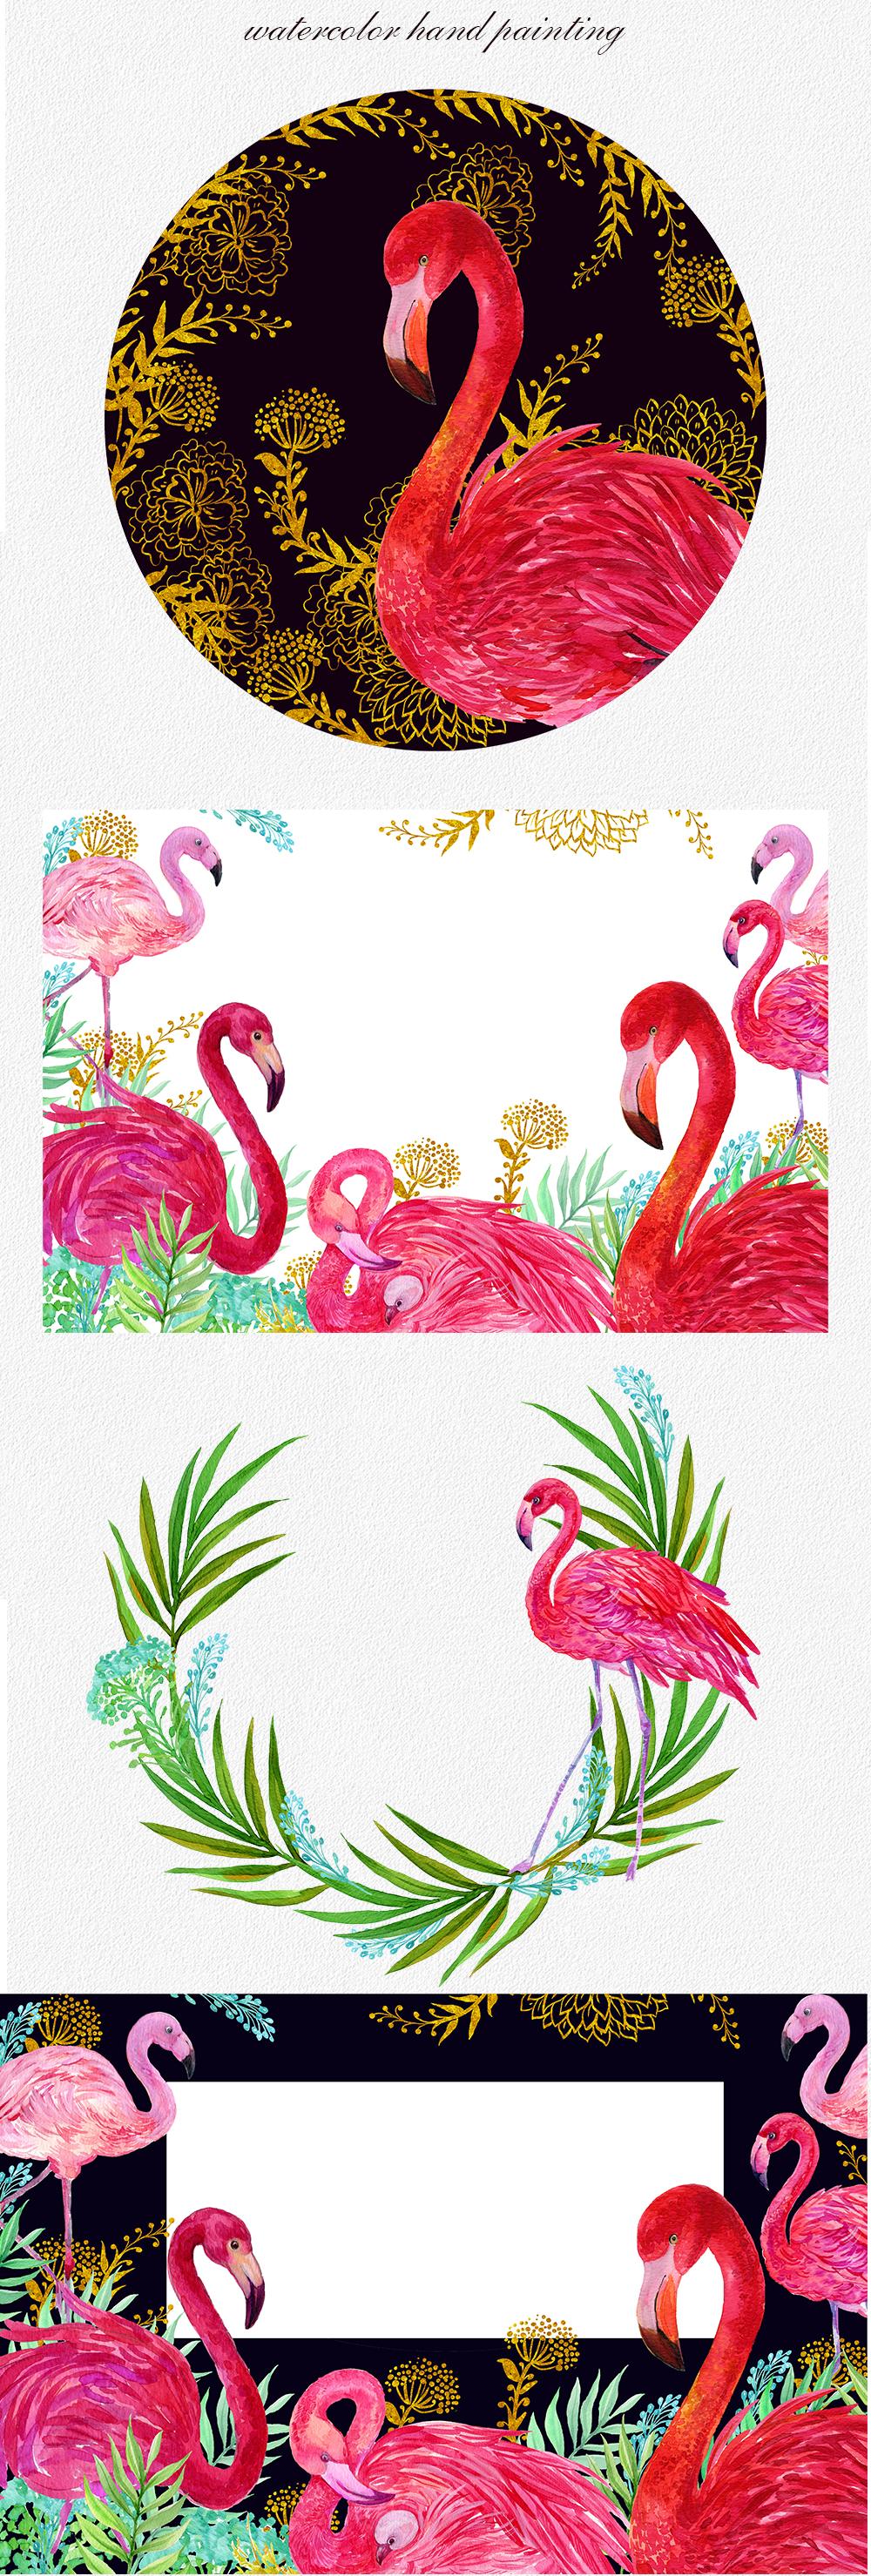 Flamingo.birds clipart. Watercolor Illustration example image 3